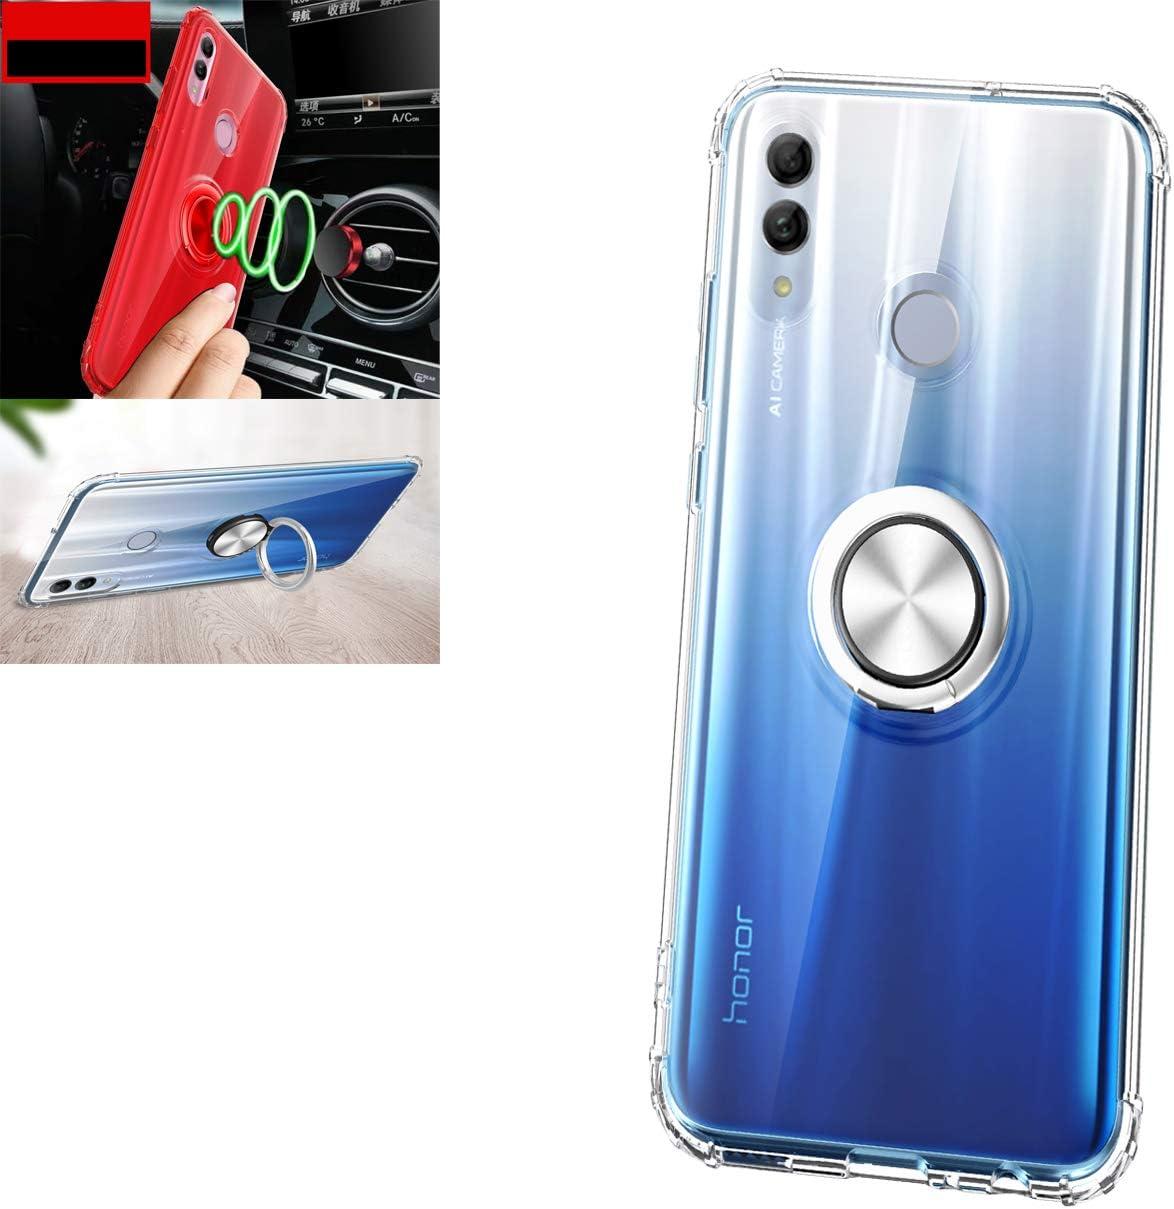 Funda Para Huawei Honor 10 Lite P Smart 2019 Case 360 Grados Giratorio Finger Ring Holder Montaje De Coche Magnético Silicona Antichoque Tpu Pc Cover Para Huawei Honor 10 Lite P Smart 2019 Case Transparente